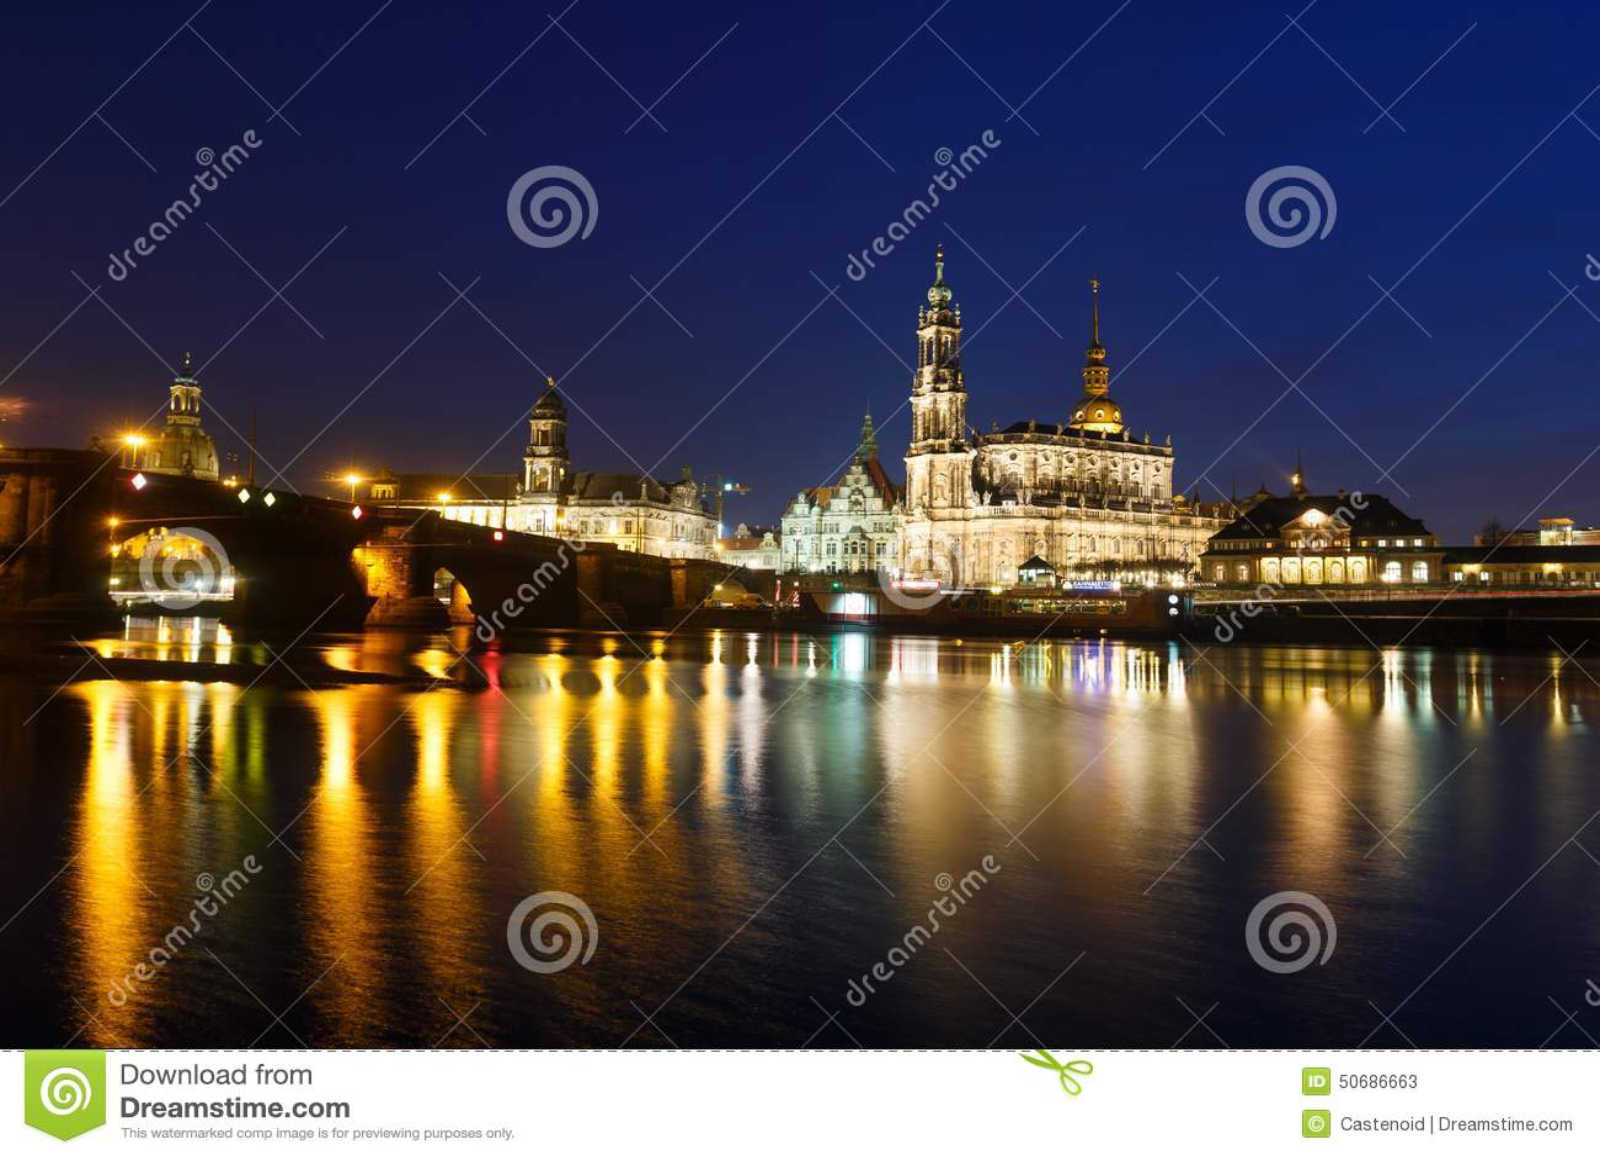 Download 德累斯顿都市风景 库存图片. 图片 包括有 晚上, 贿赂, 黄昏, 新古典主义, 古典, 安排, 地标, 夜间 - 50686663